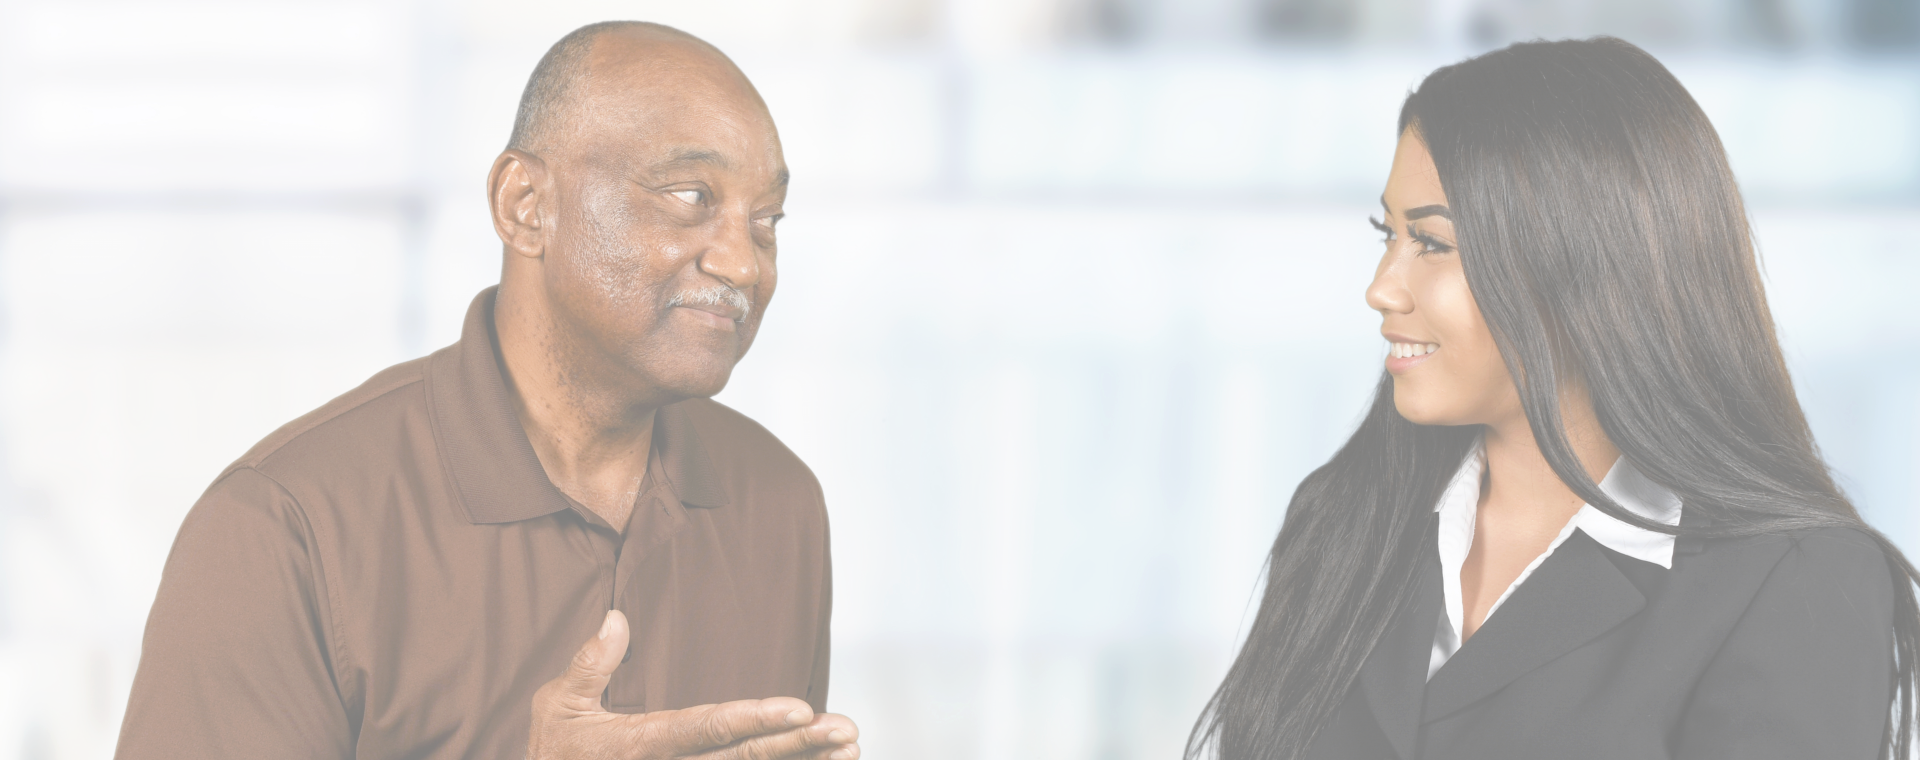 black man and woman talking